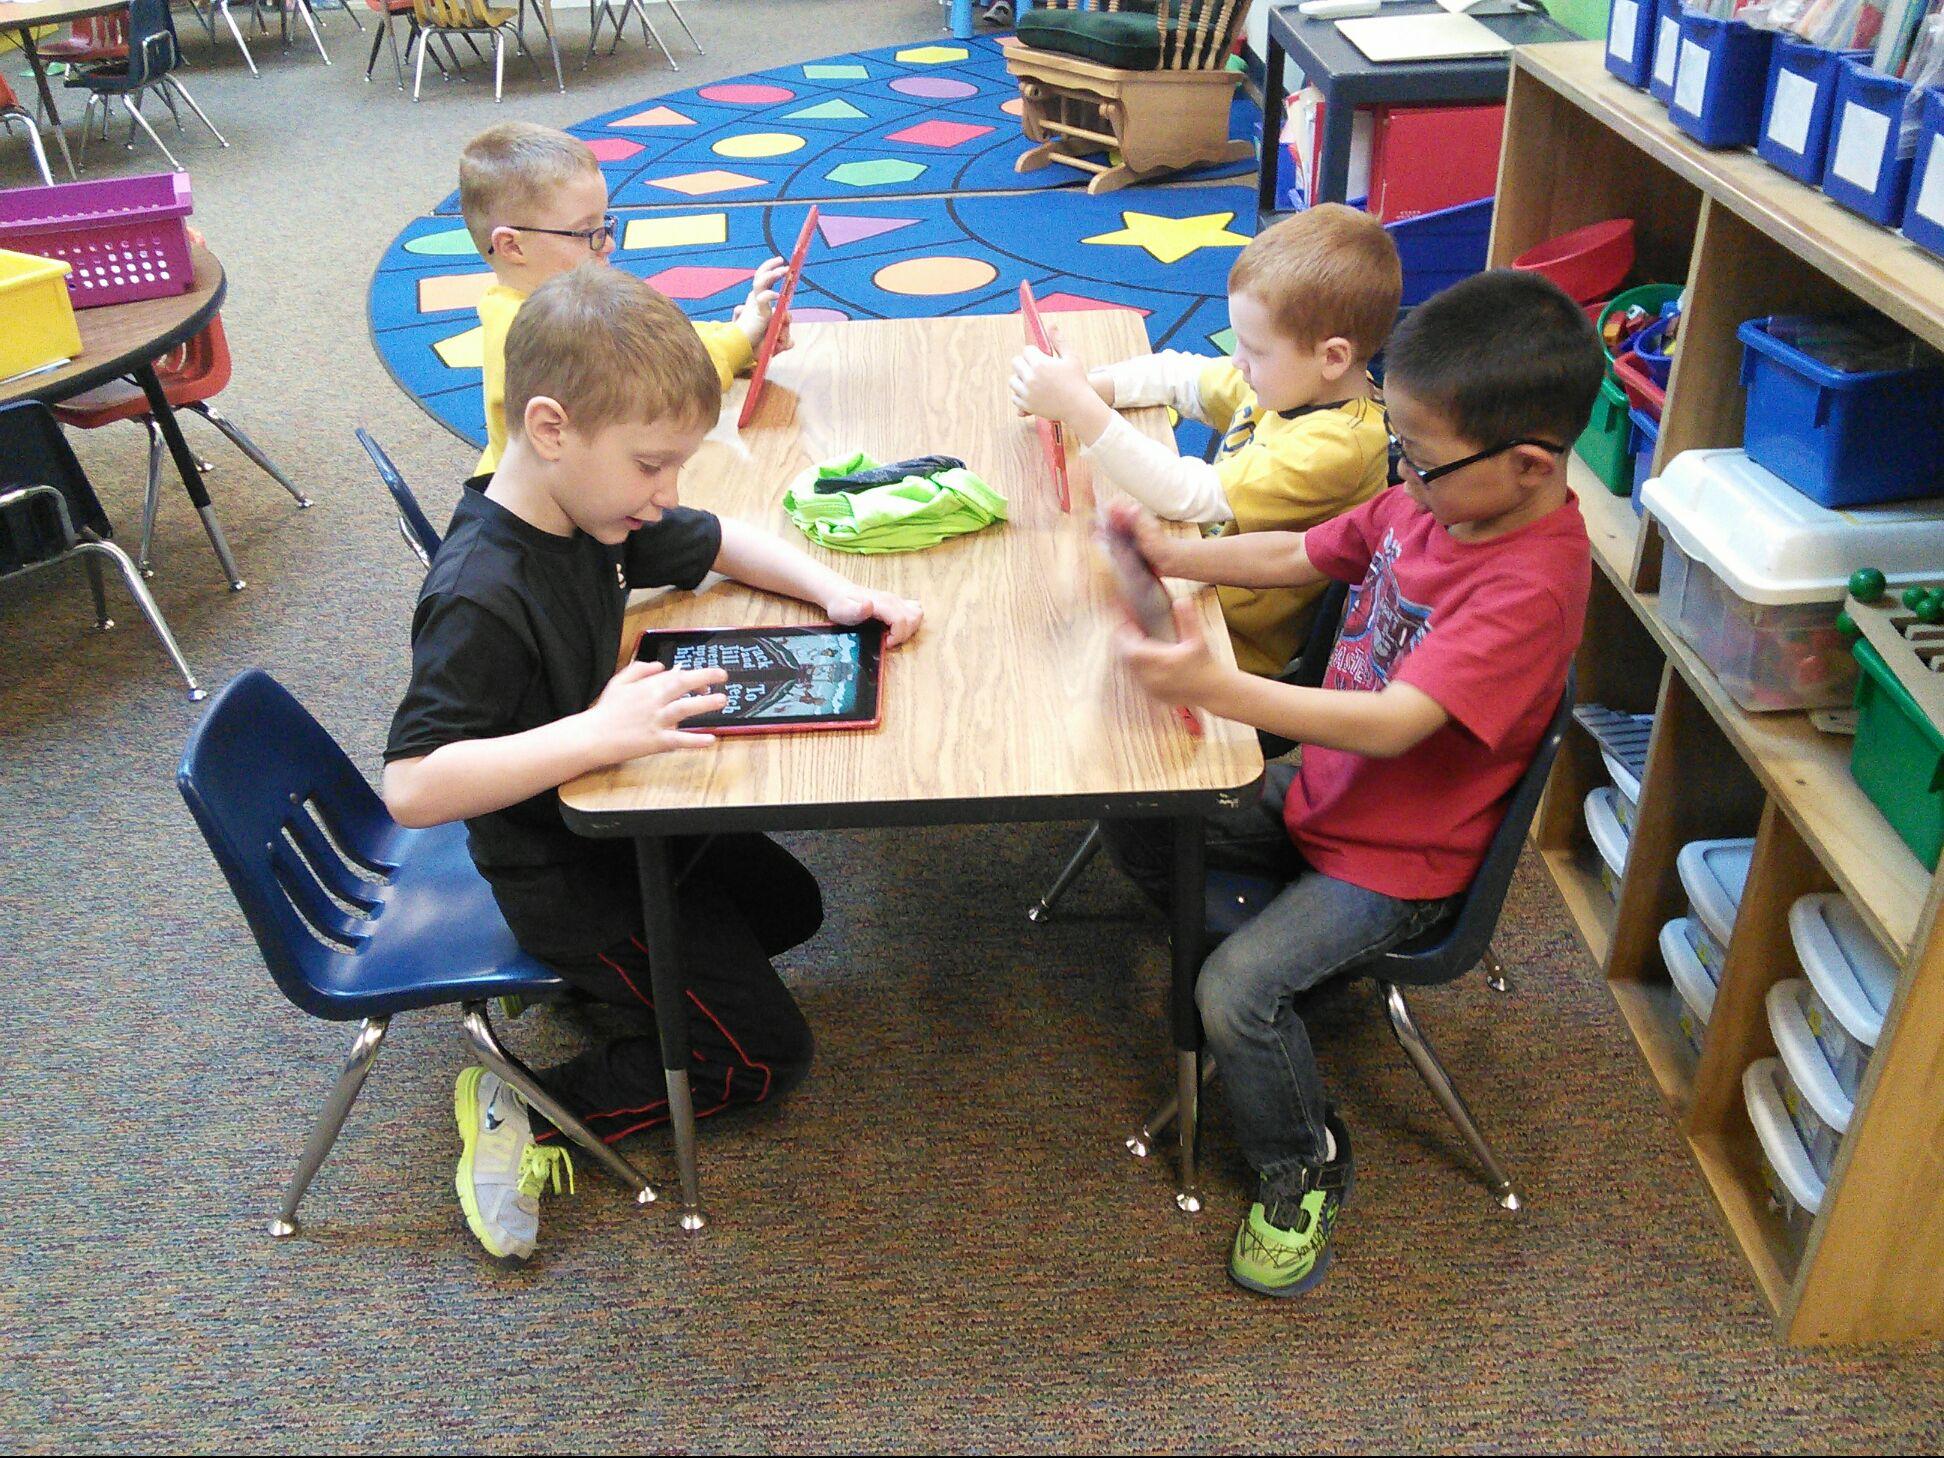 Elementary Classroom : Adel elementary classroom visits april th adm